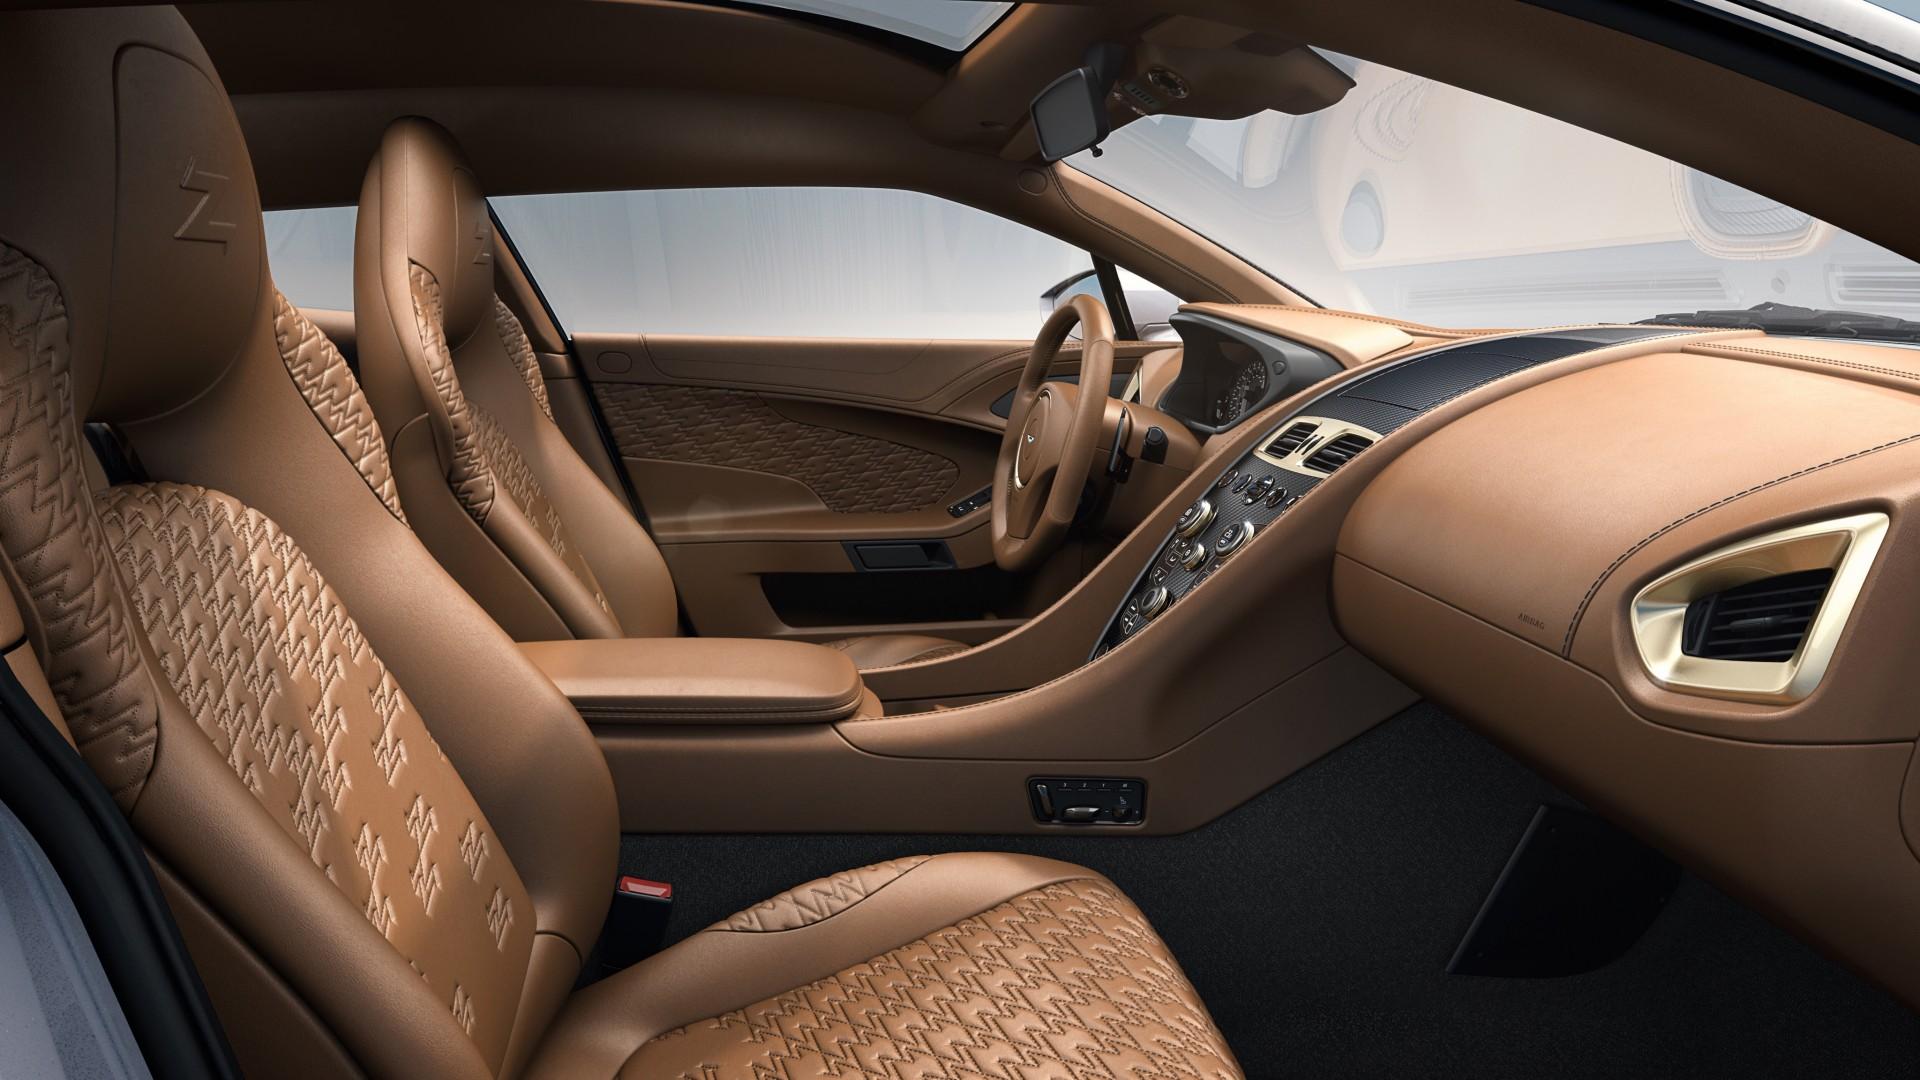 Carbon Wallpaper Iphone X Aston Martin Vanquish Zagato Shooting Brake 2019 4k